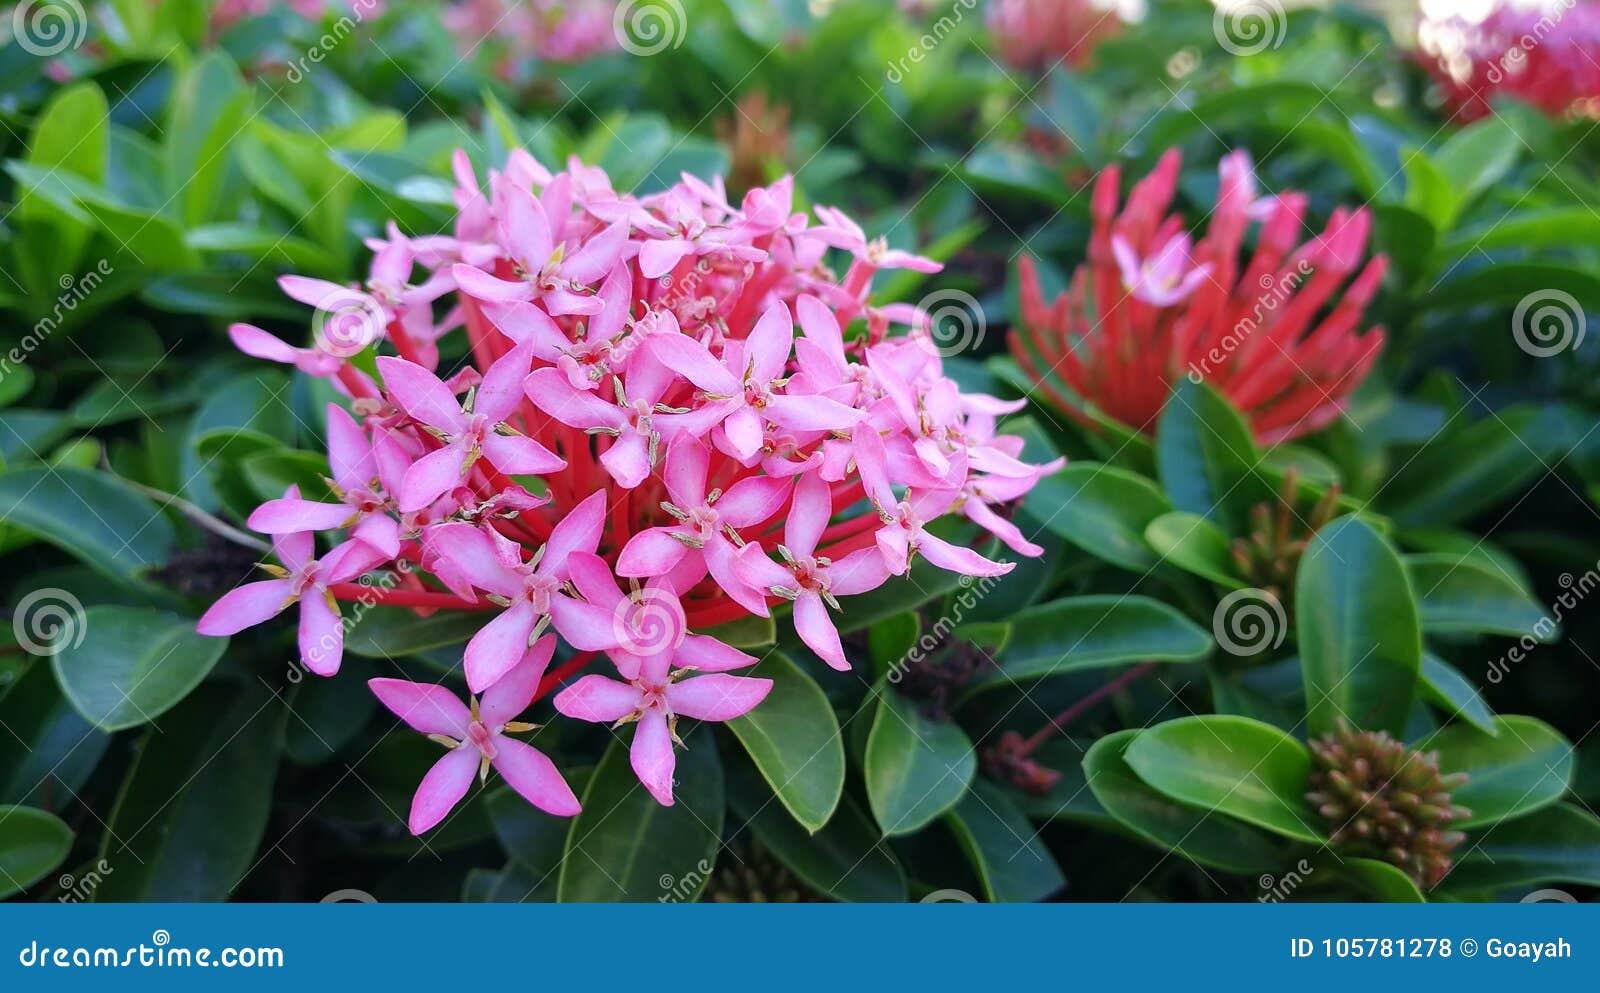 Spike Flower Stock Photo Image Of Thai Flower Pink 105781278